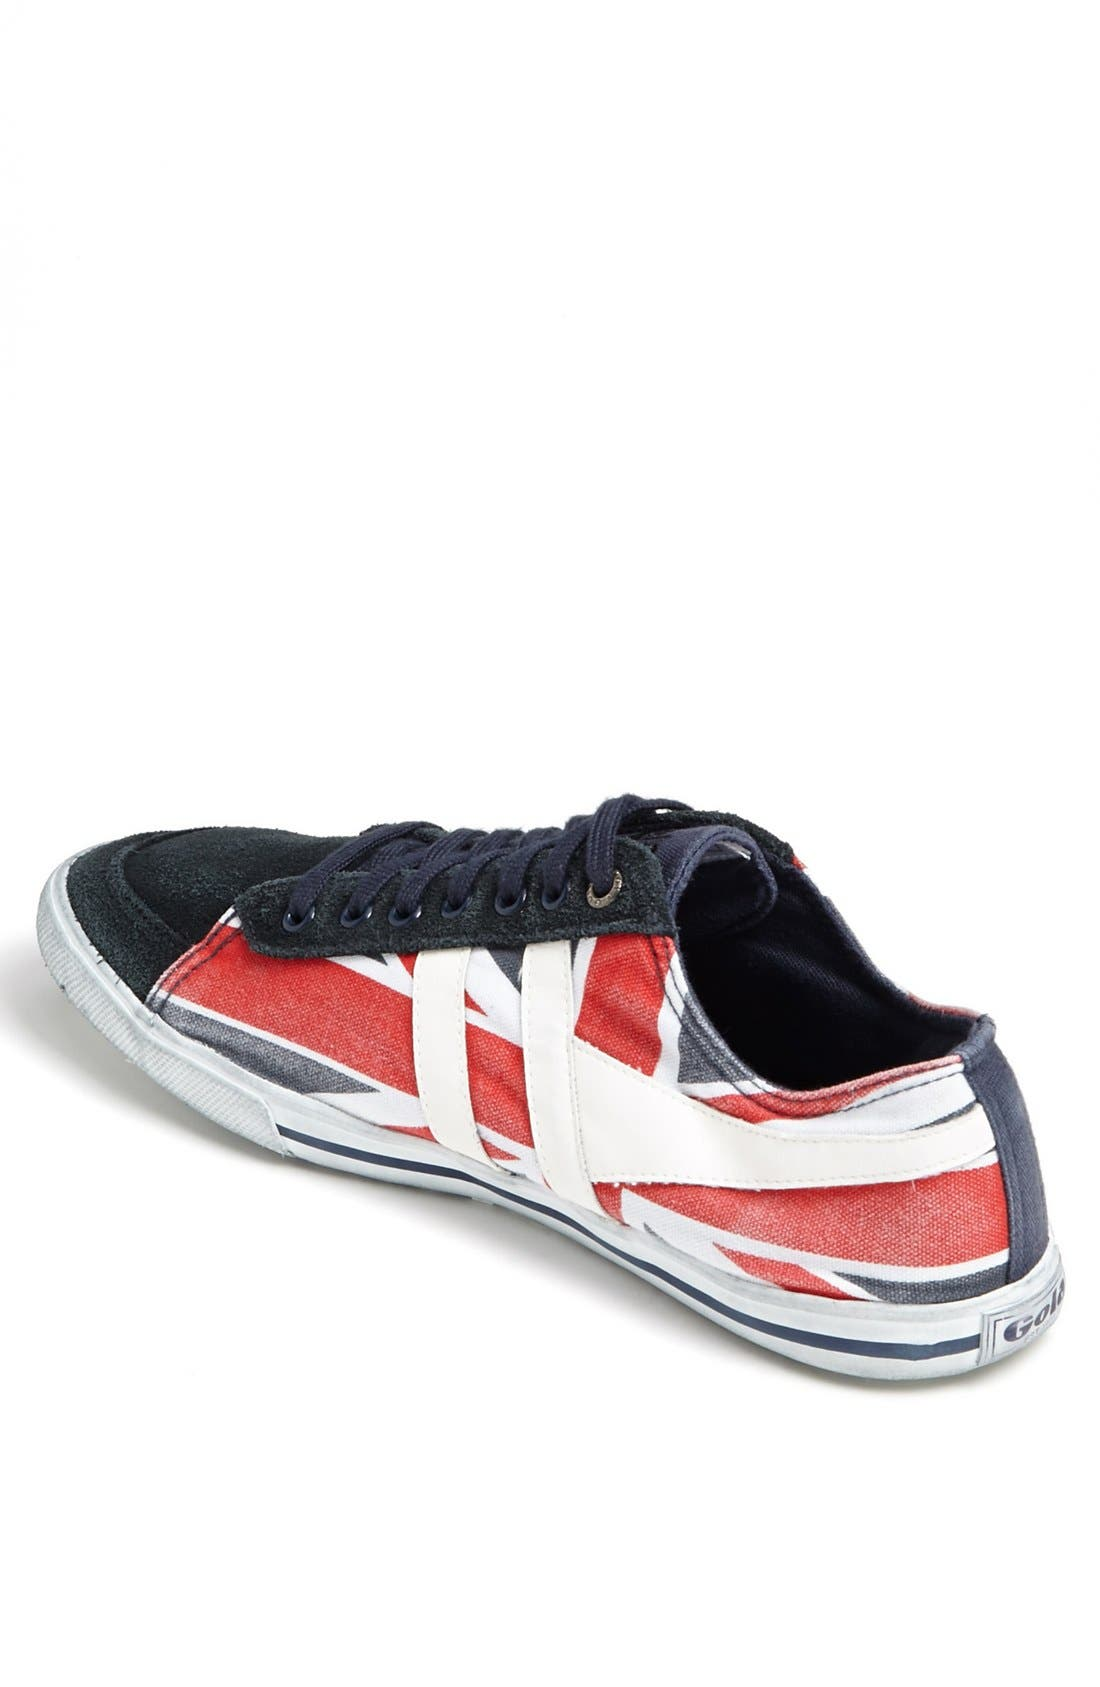 Alternate Image 2  - Gola 'Quota - Union Jack' Sneaker (Men)